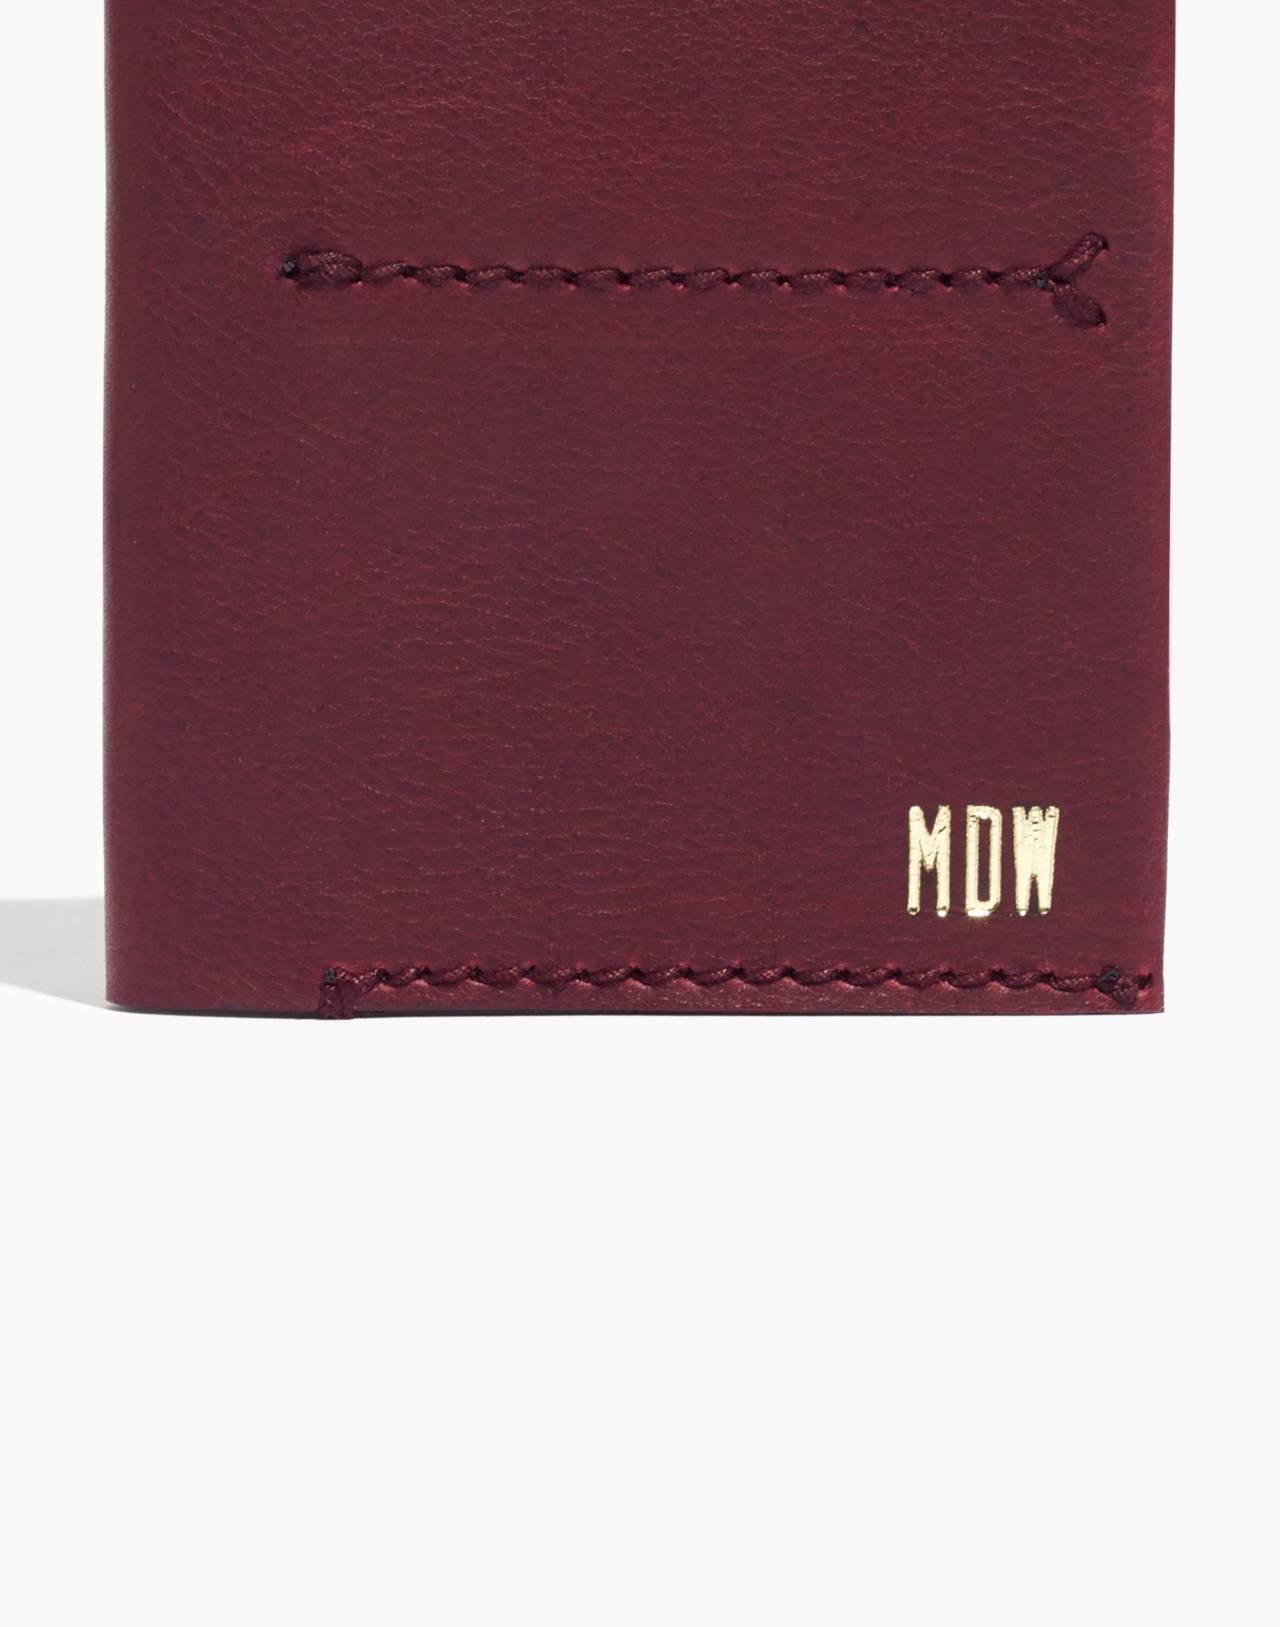 The Leather Passport Case in dark cabernet image 3